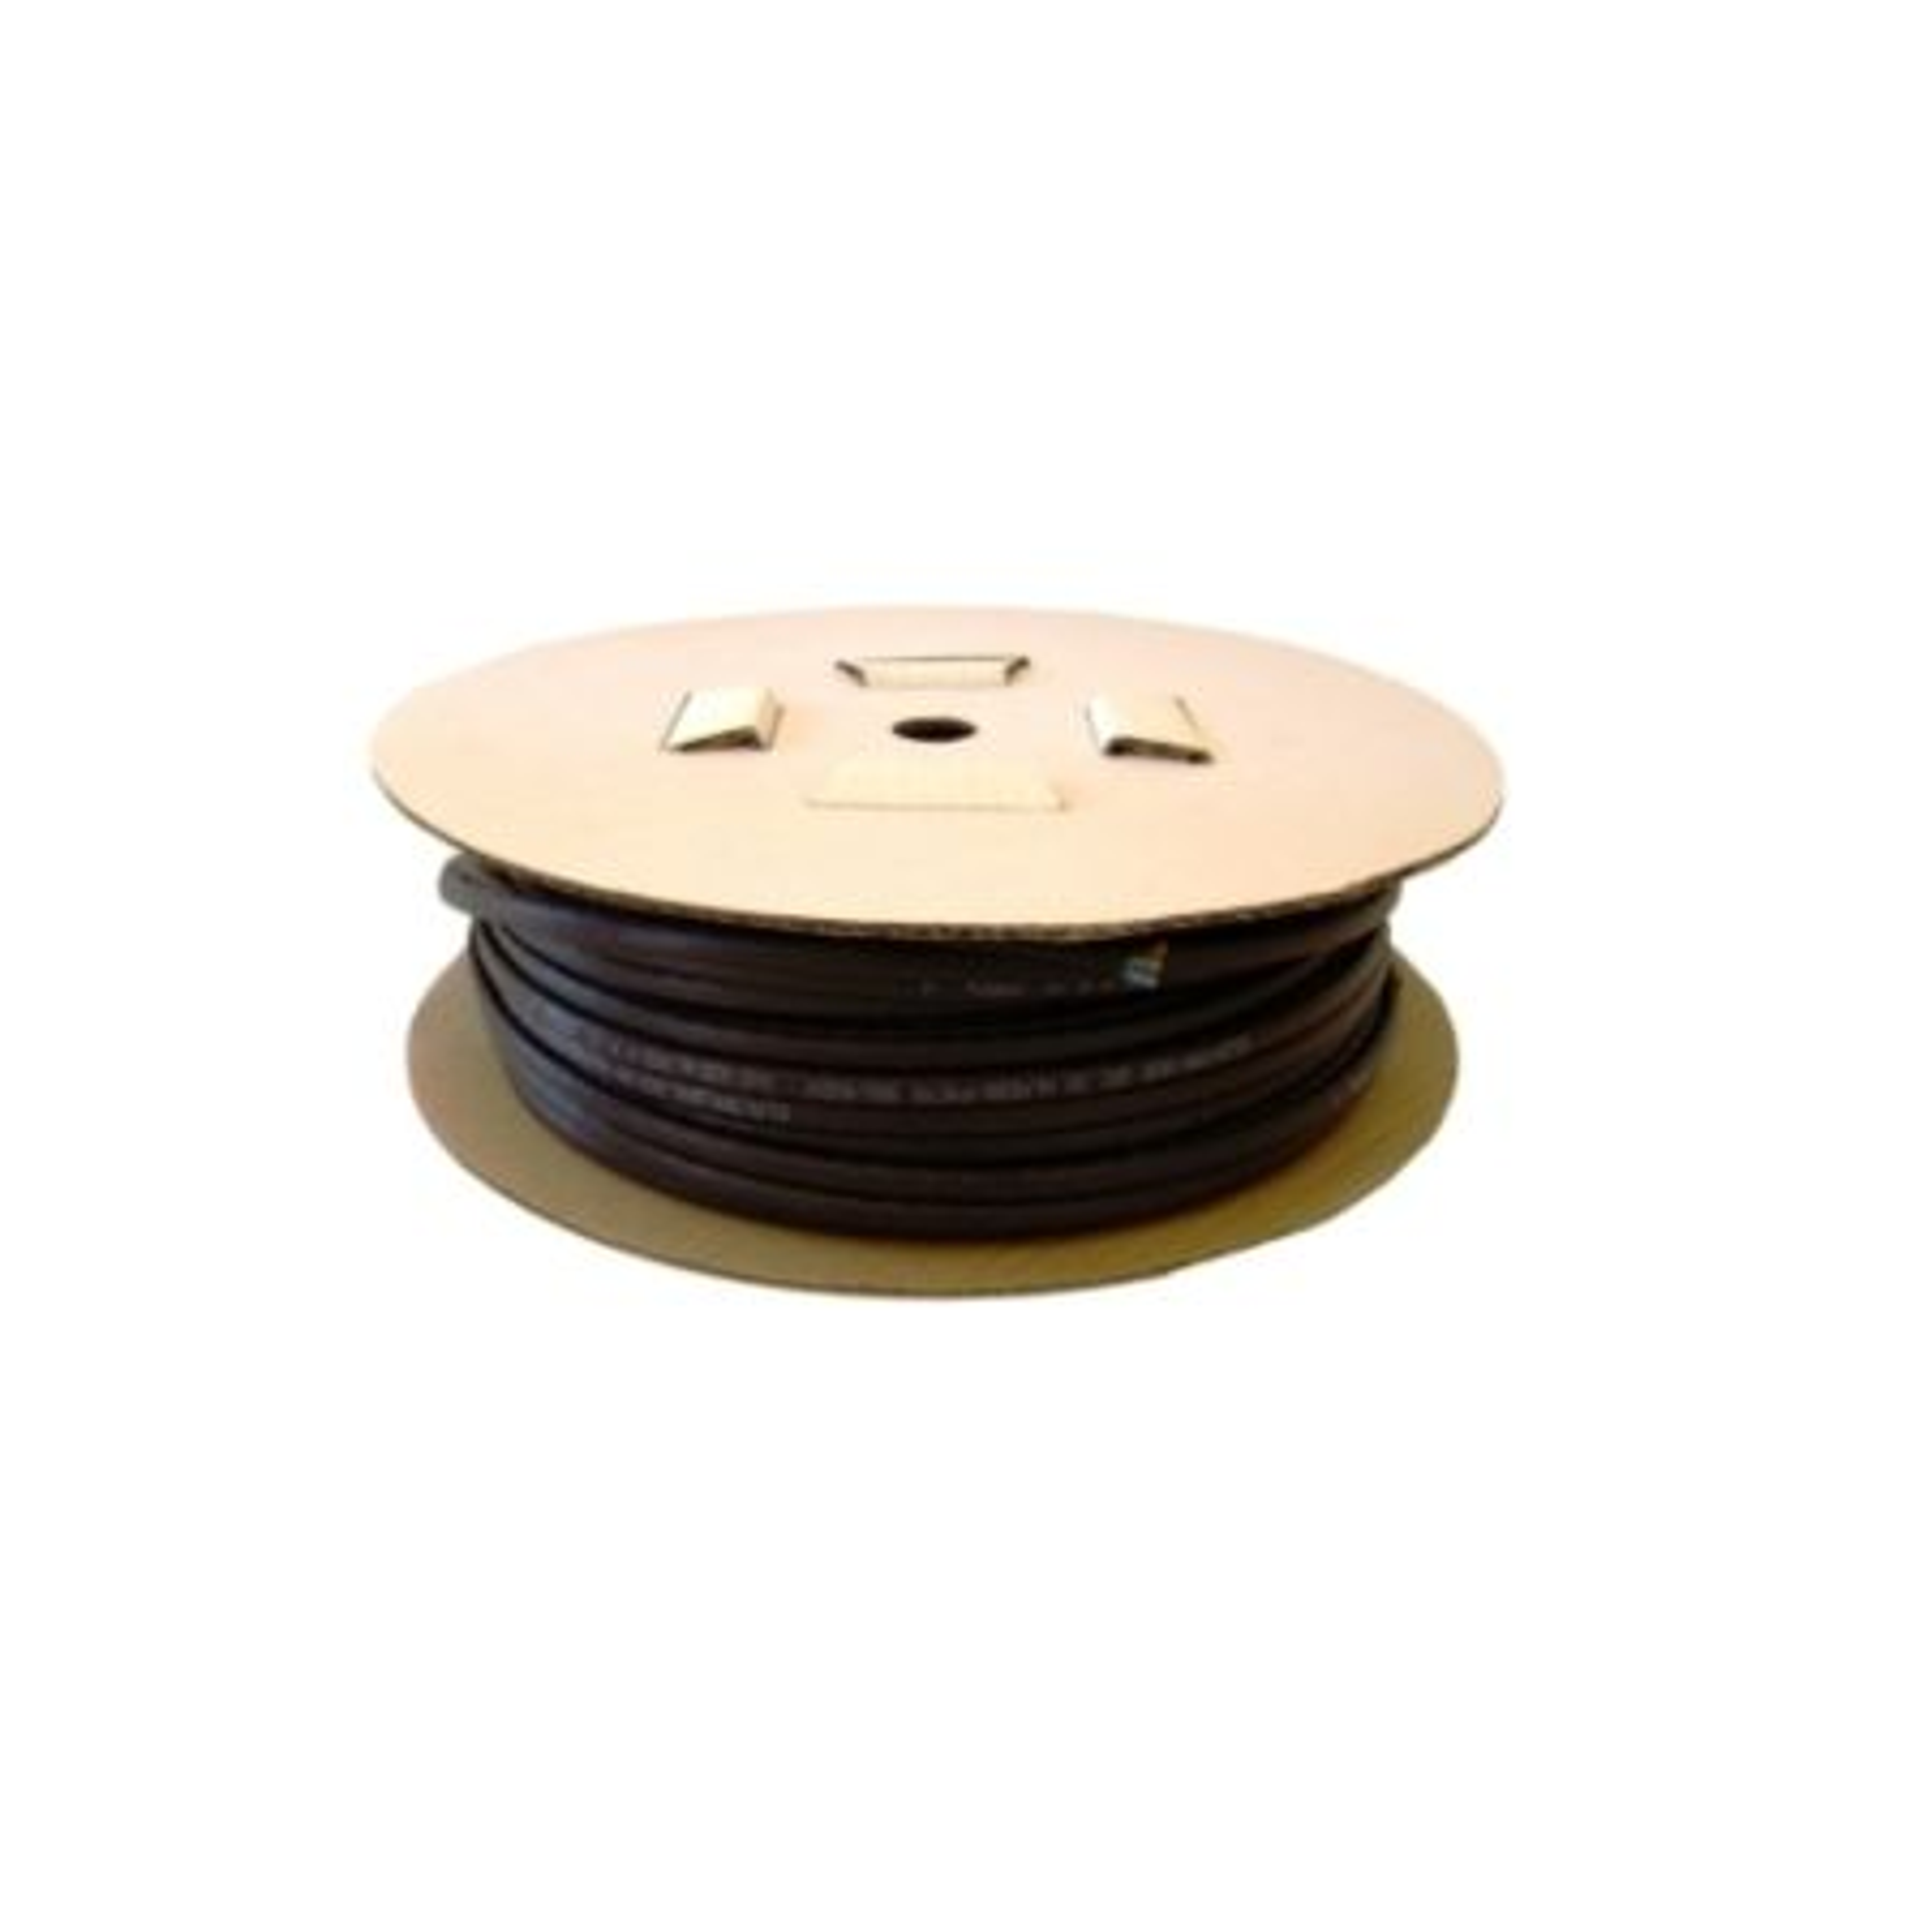 V-SYSTÉM Kabel TO-2R-50-1000 50M/1000W topný